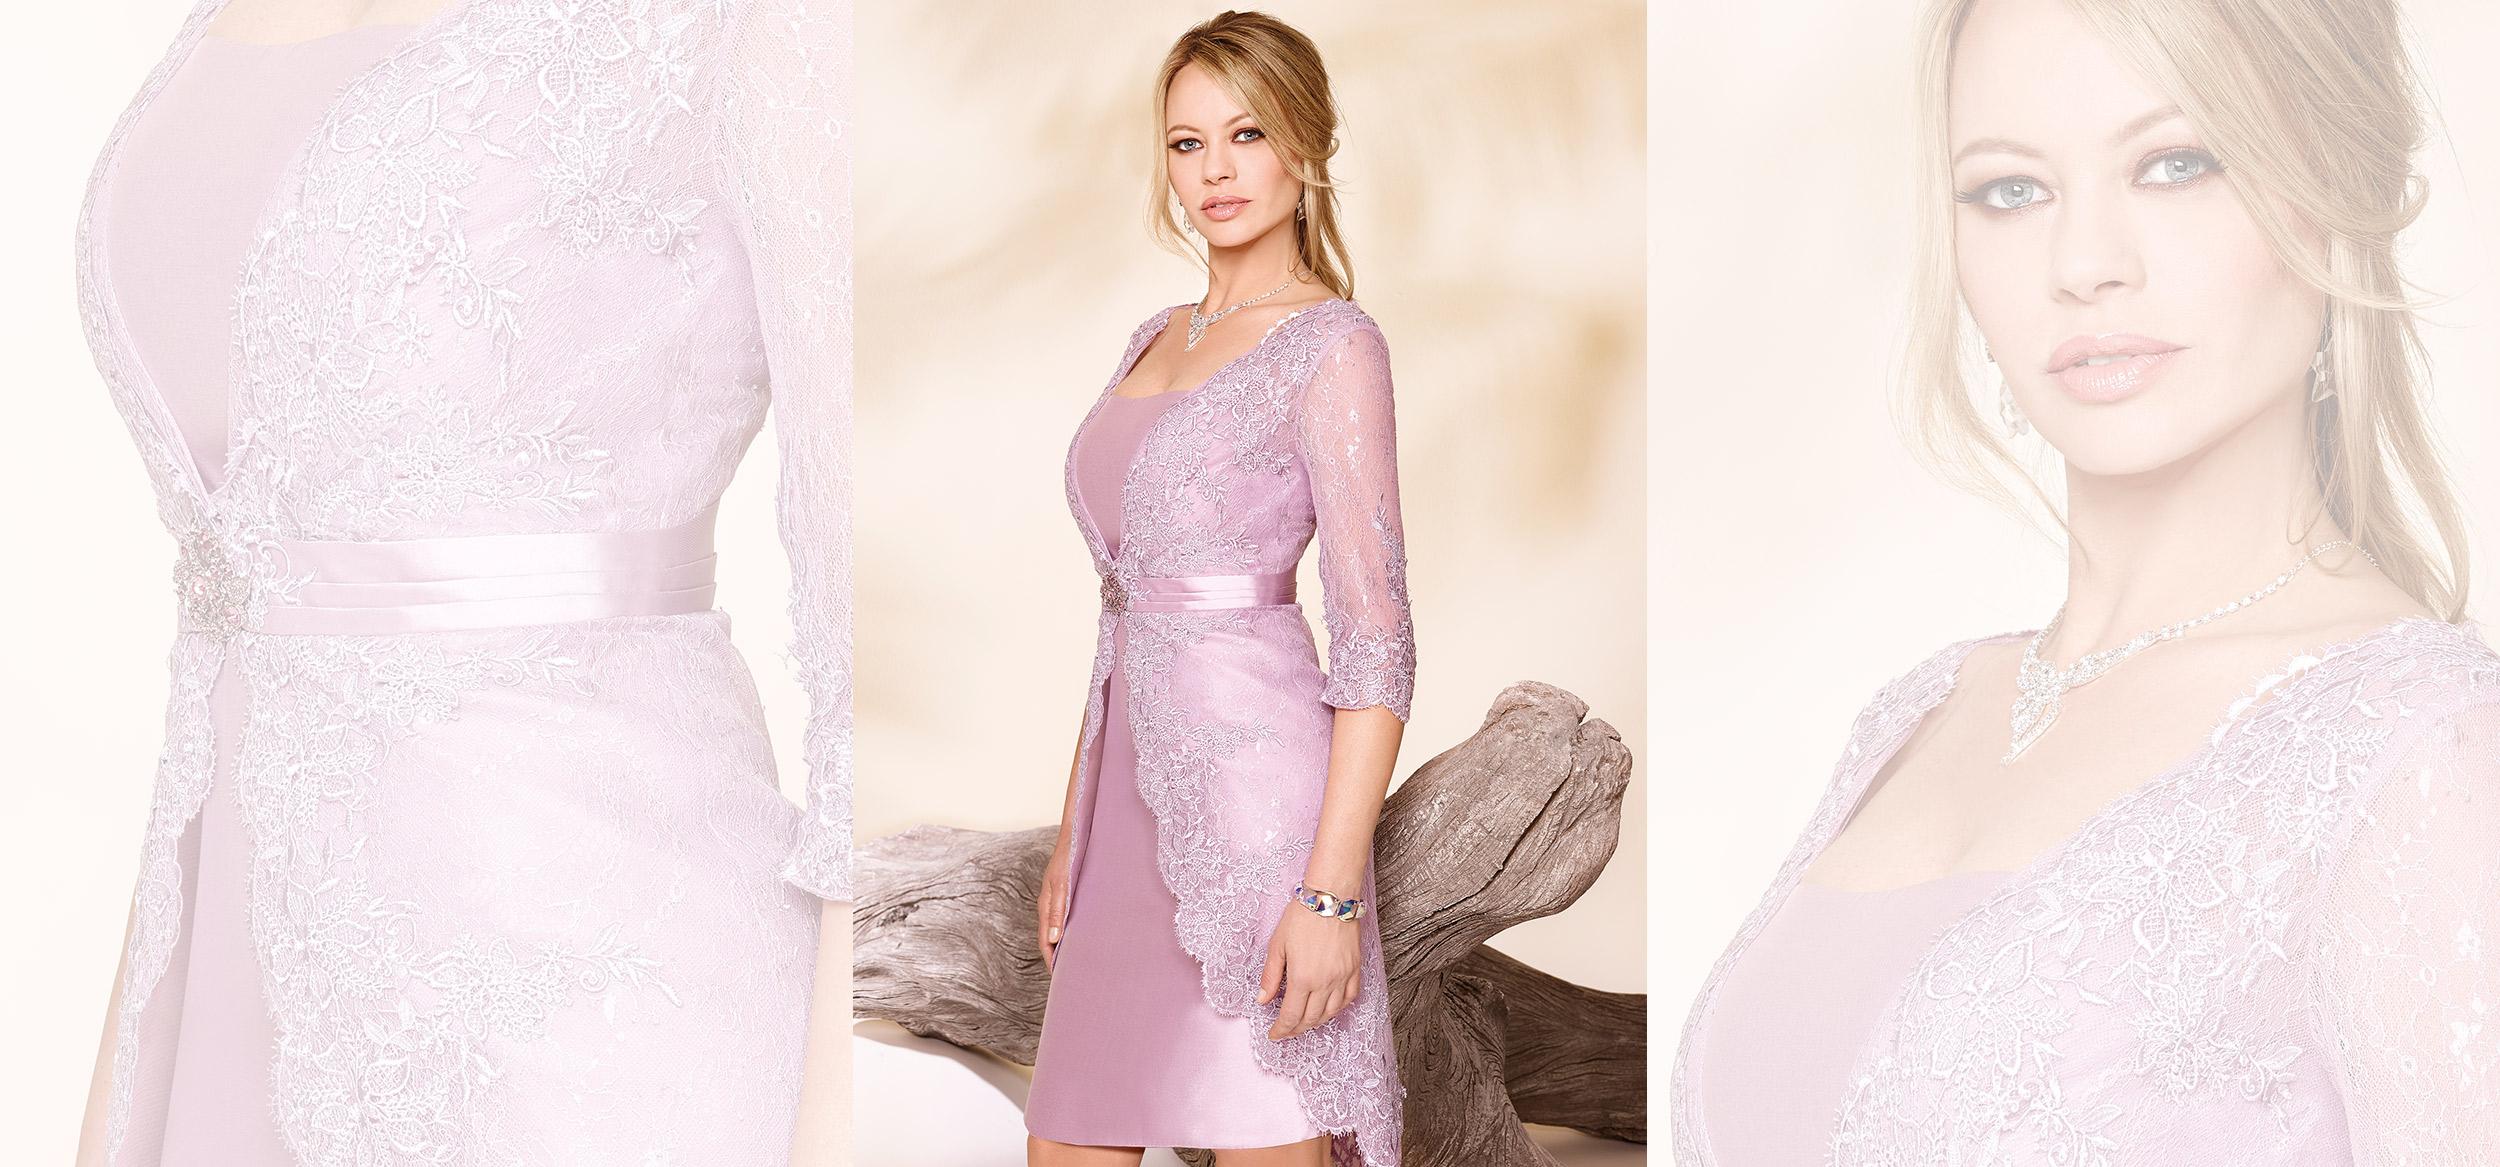 2016 Collezione Donna8da Musani Couture Cerimonia Fjct3luk15 Abiti 34RAjq5L